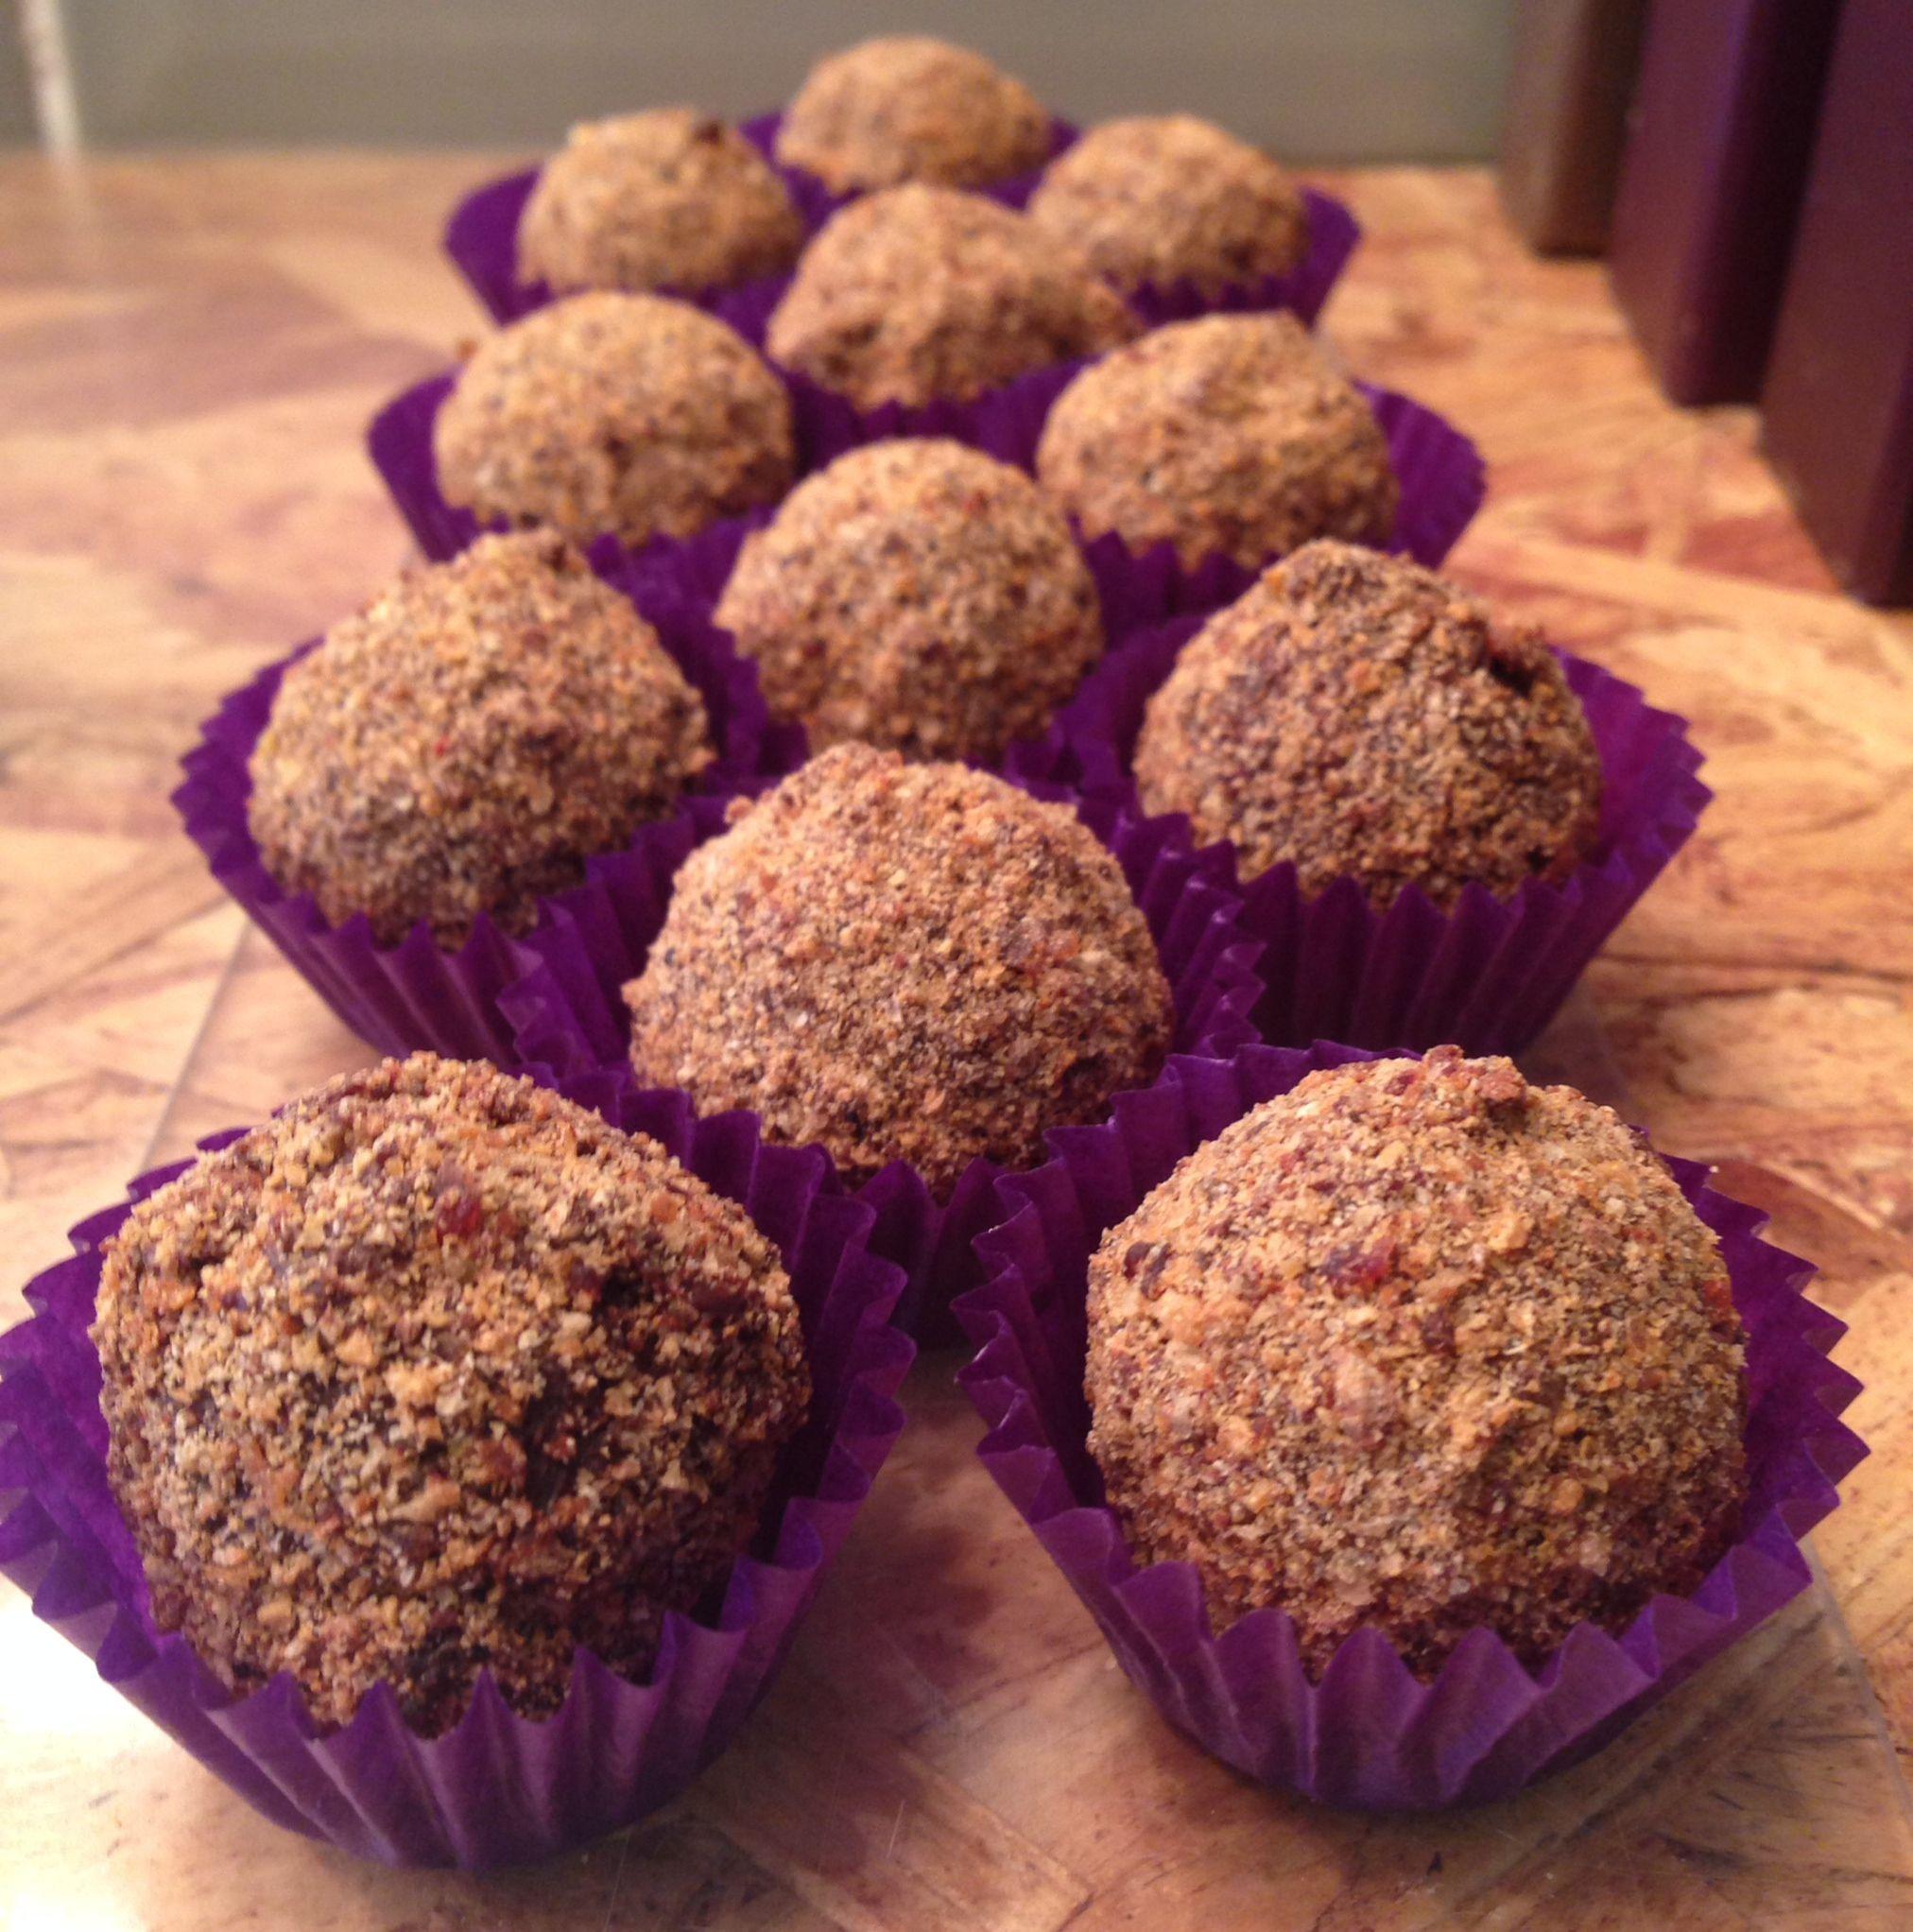 Hot cross bun chocolate truffles - rich, decadent